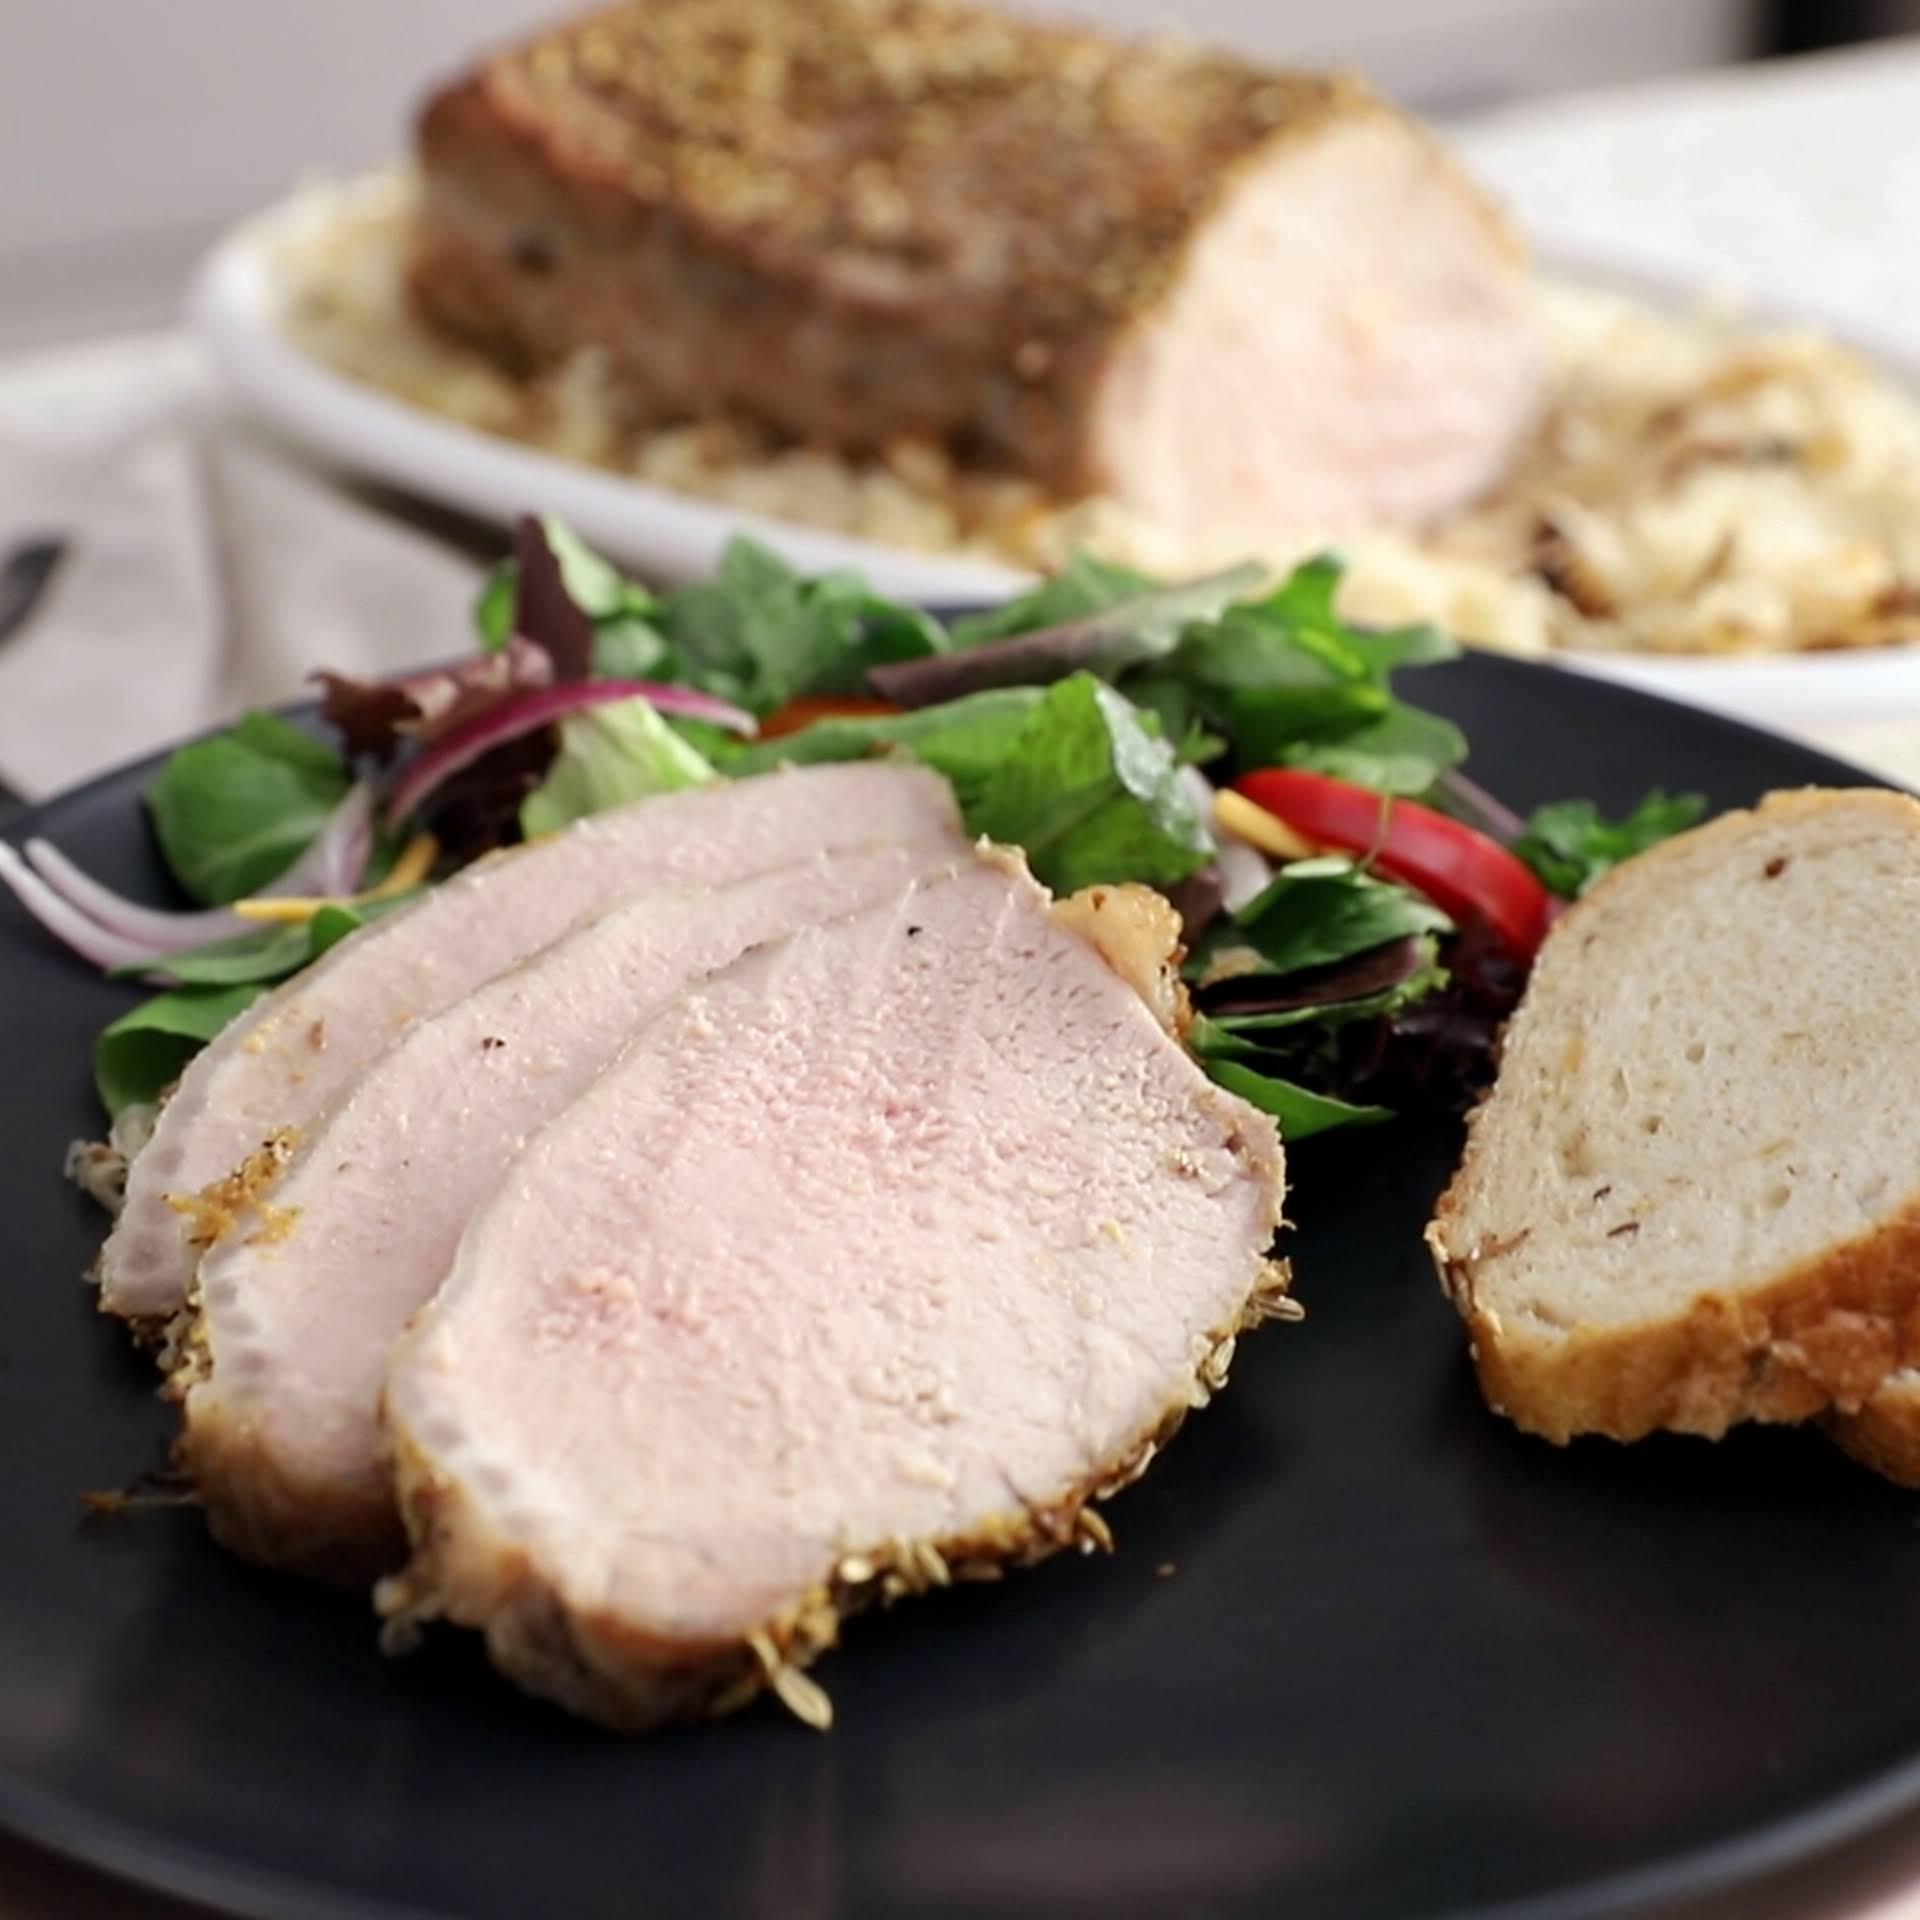 10 Best Boneless Pork Loin With Sauerkraut Recipes Yummly